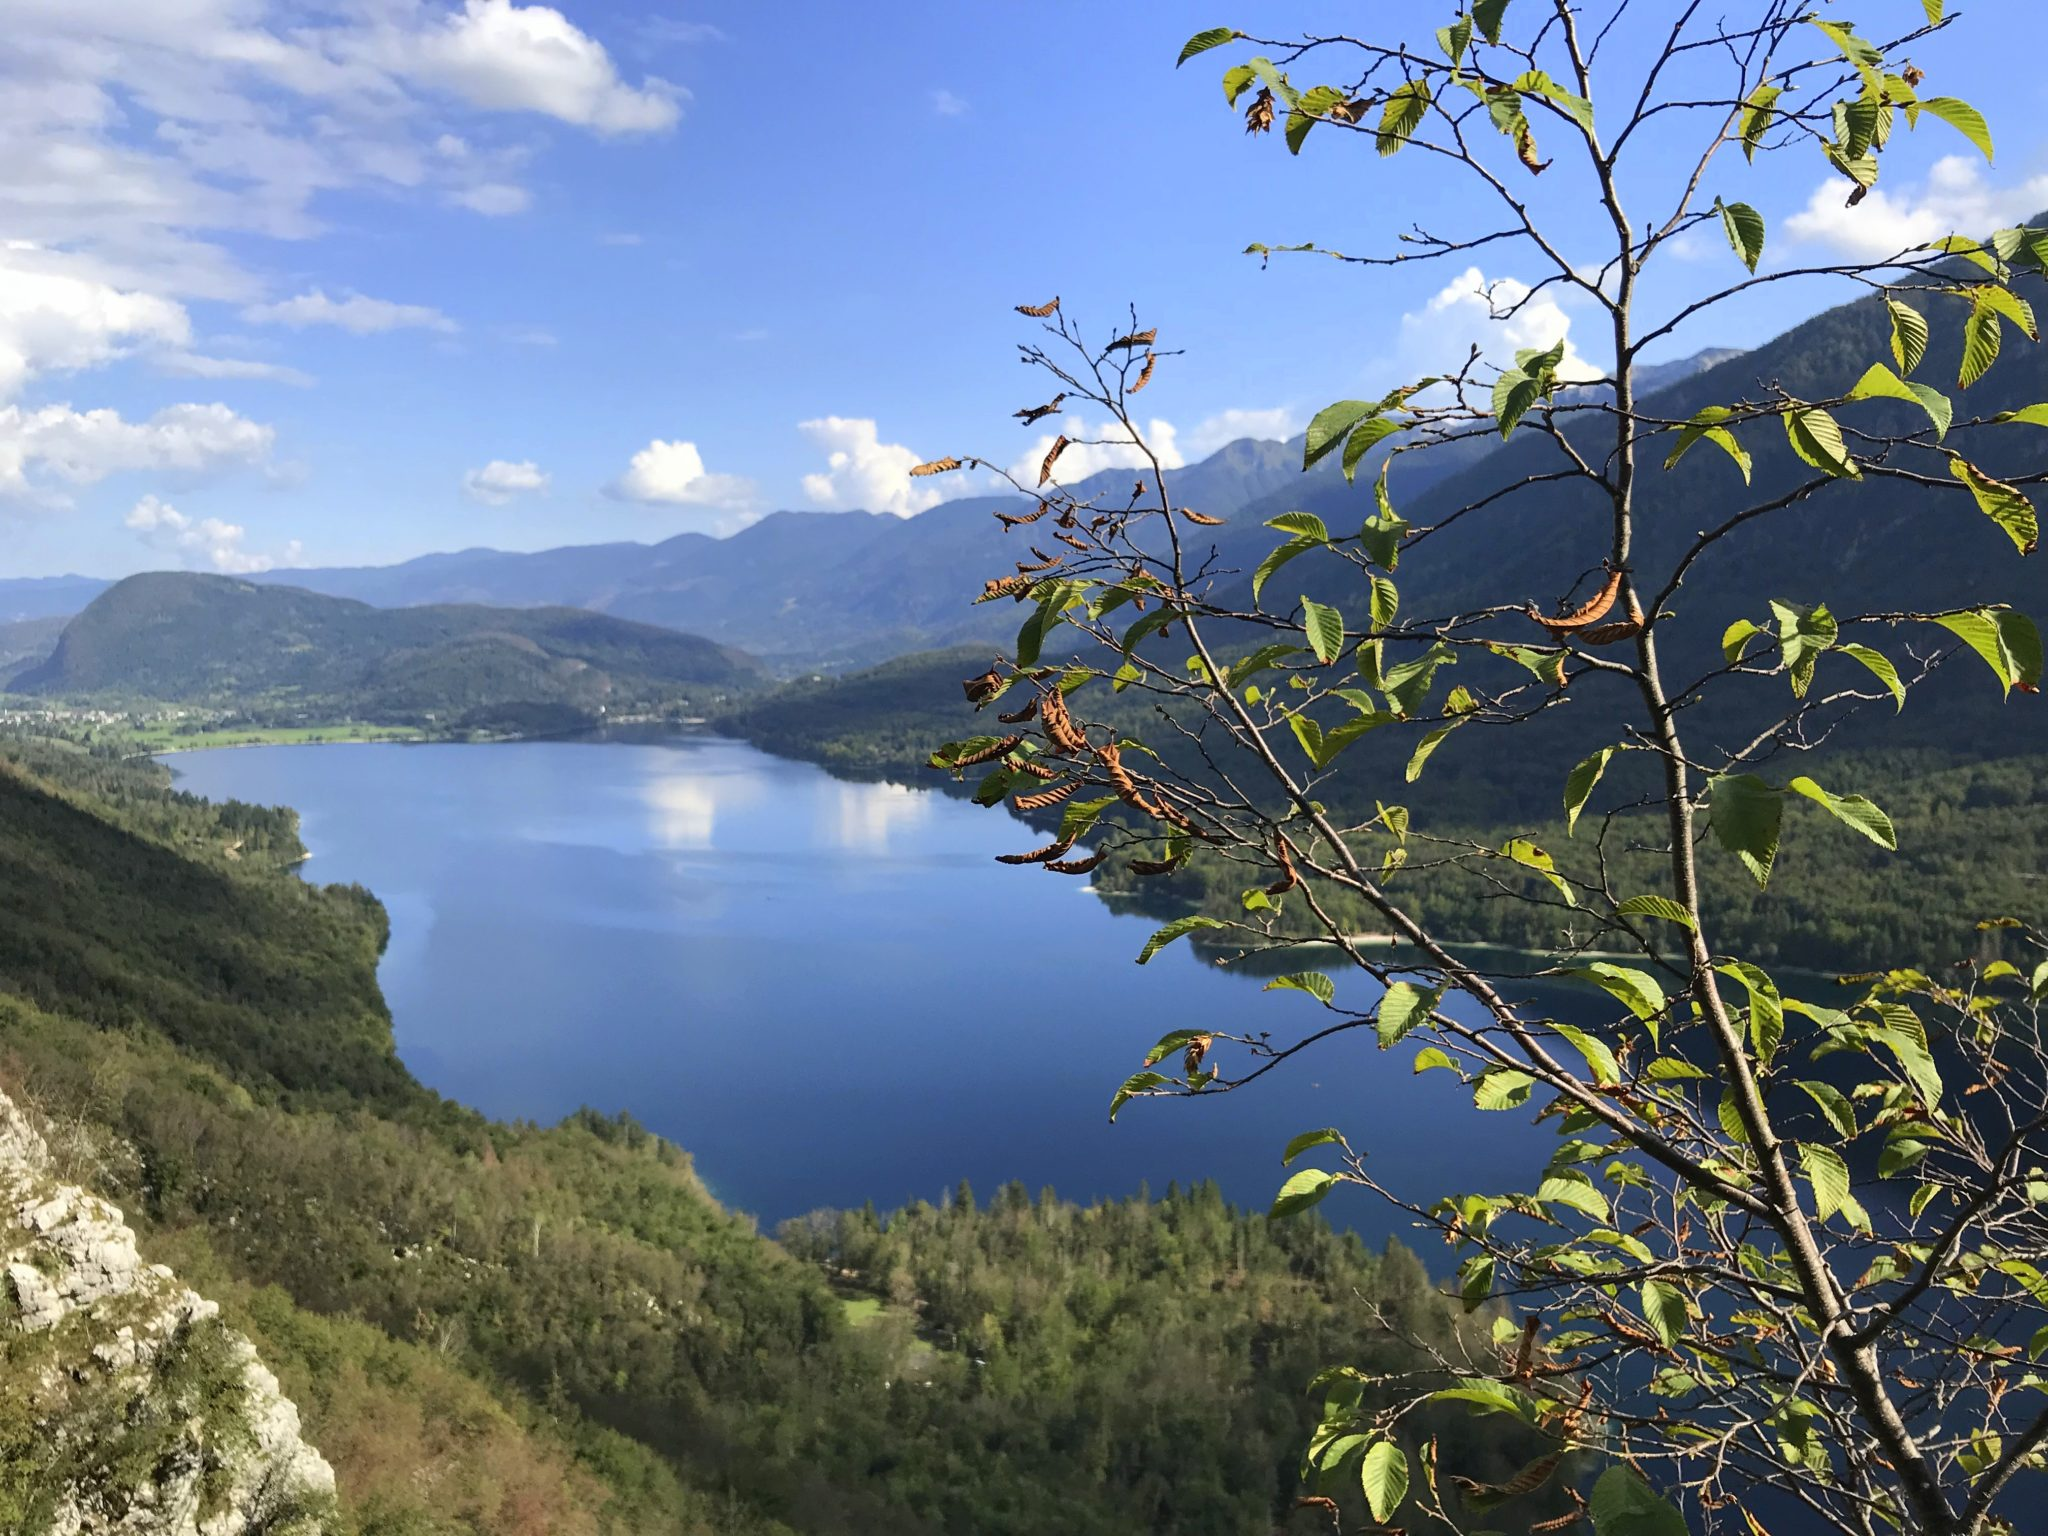 Lake Bohinj as seen from the via ferrata called Ožarjeni Kamen